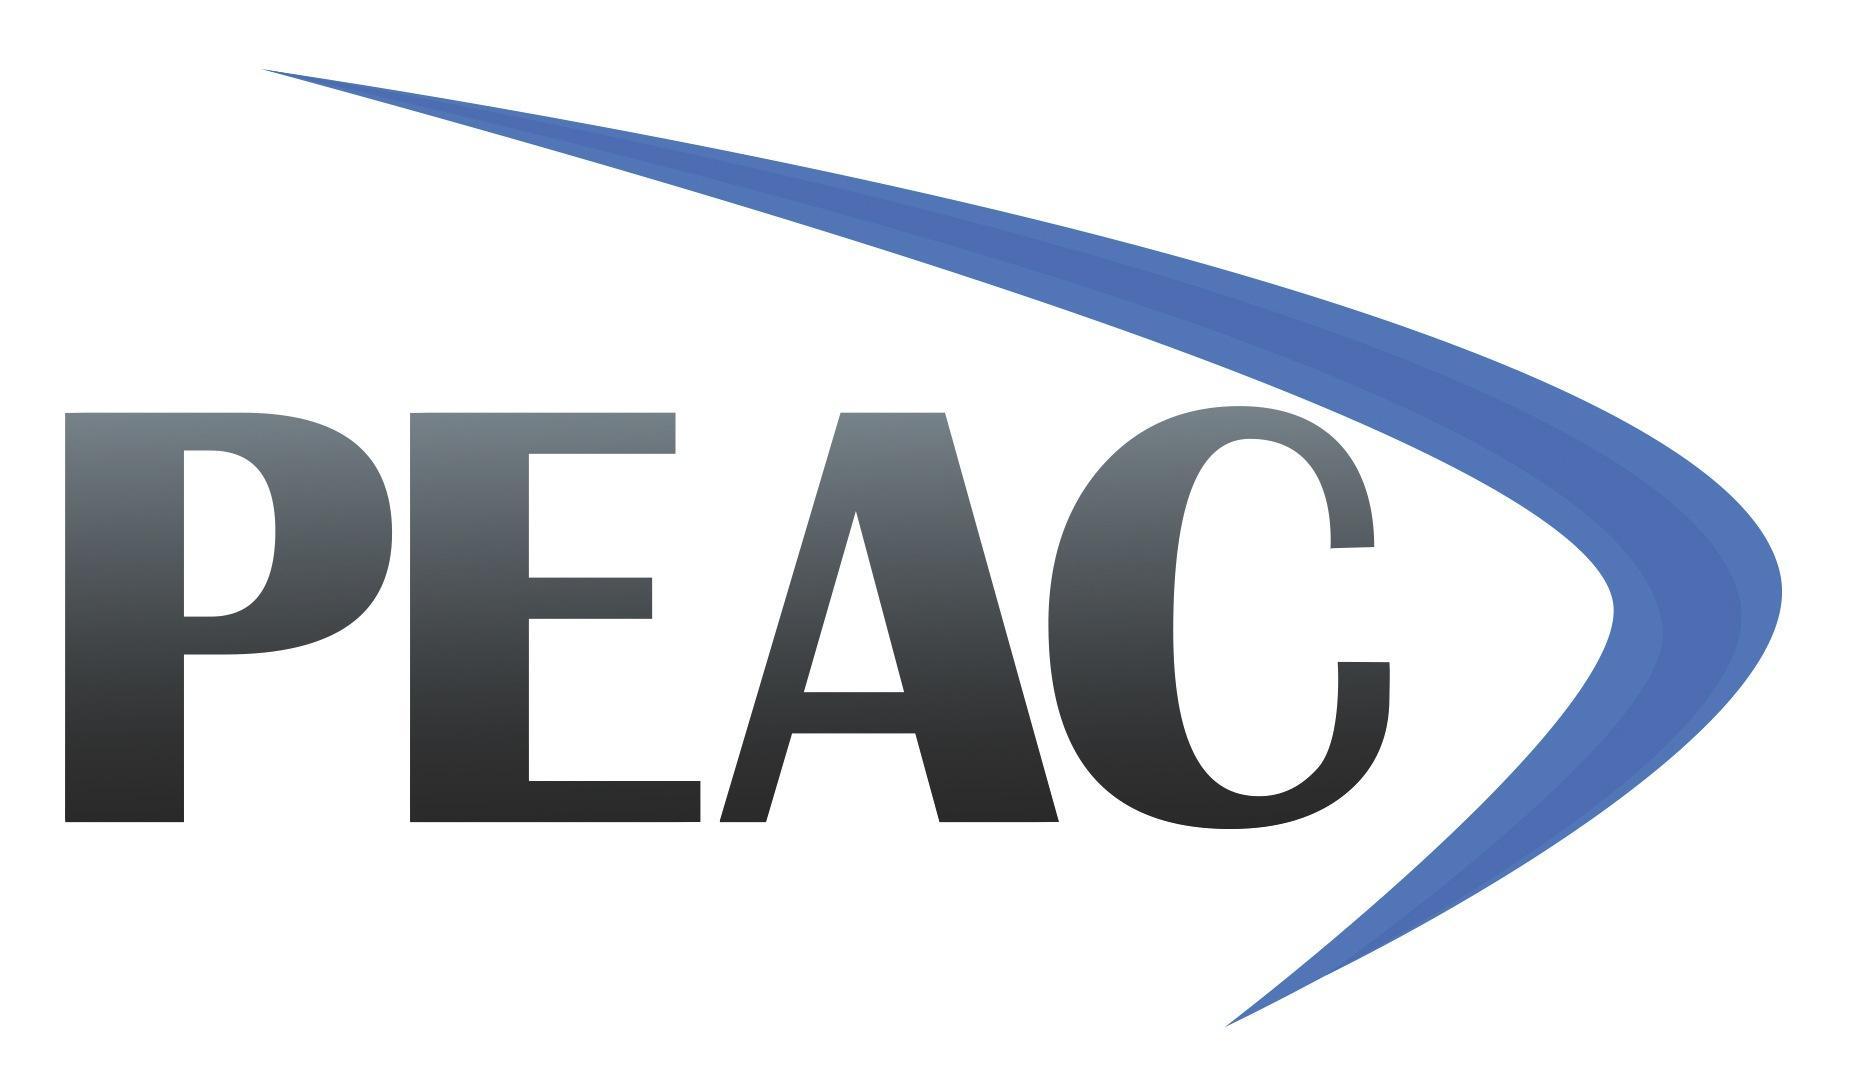 Saline Tuesday & Thursday PEAC Registration 2